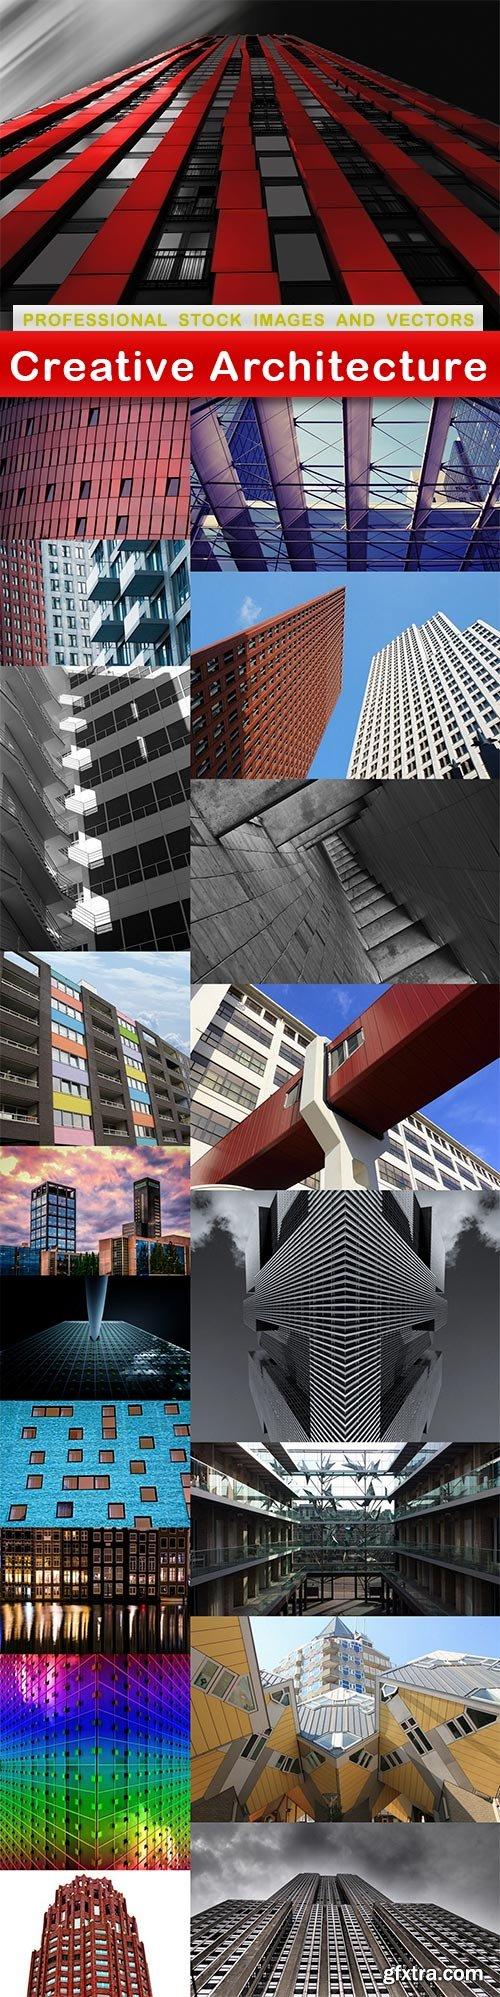 Creative Architecture - 19 UHQ JPEG